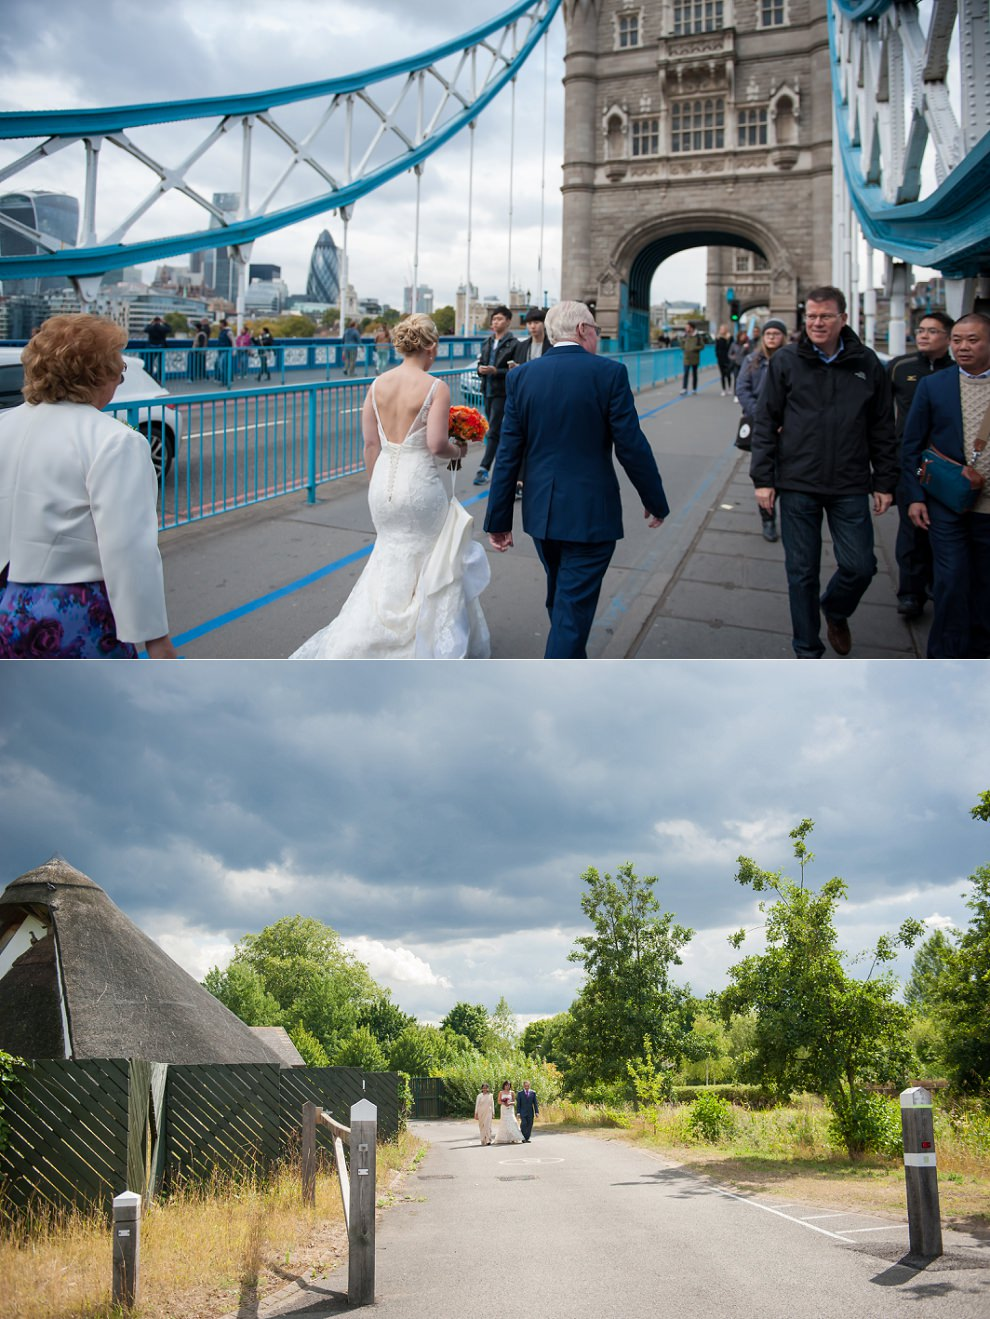 Best-wedding-photos-UK-2015-045